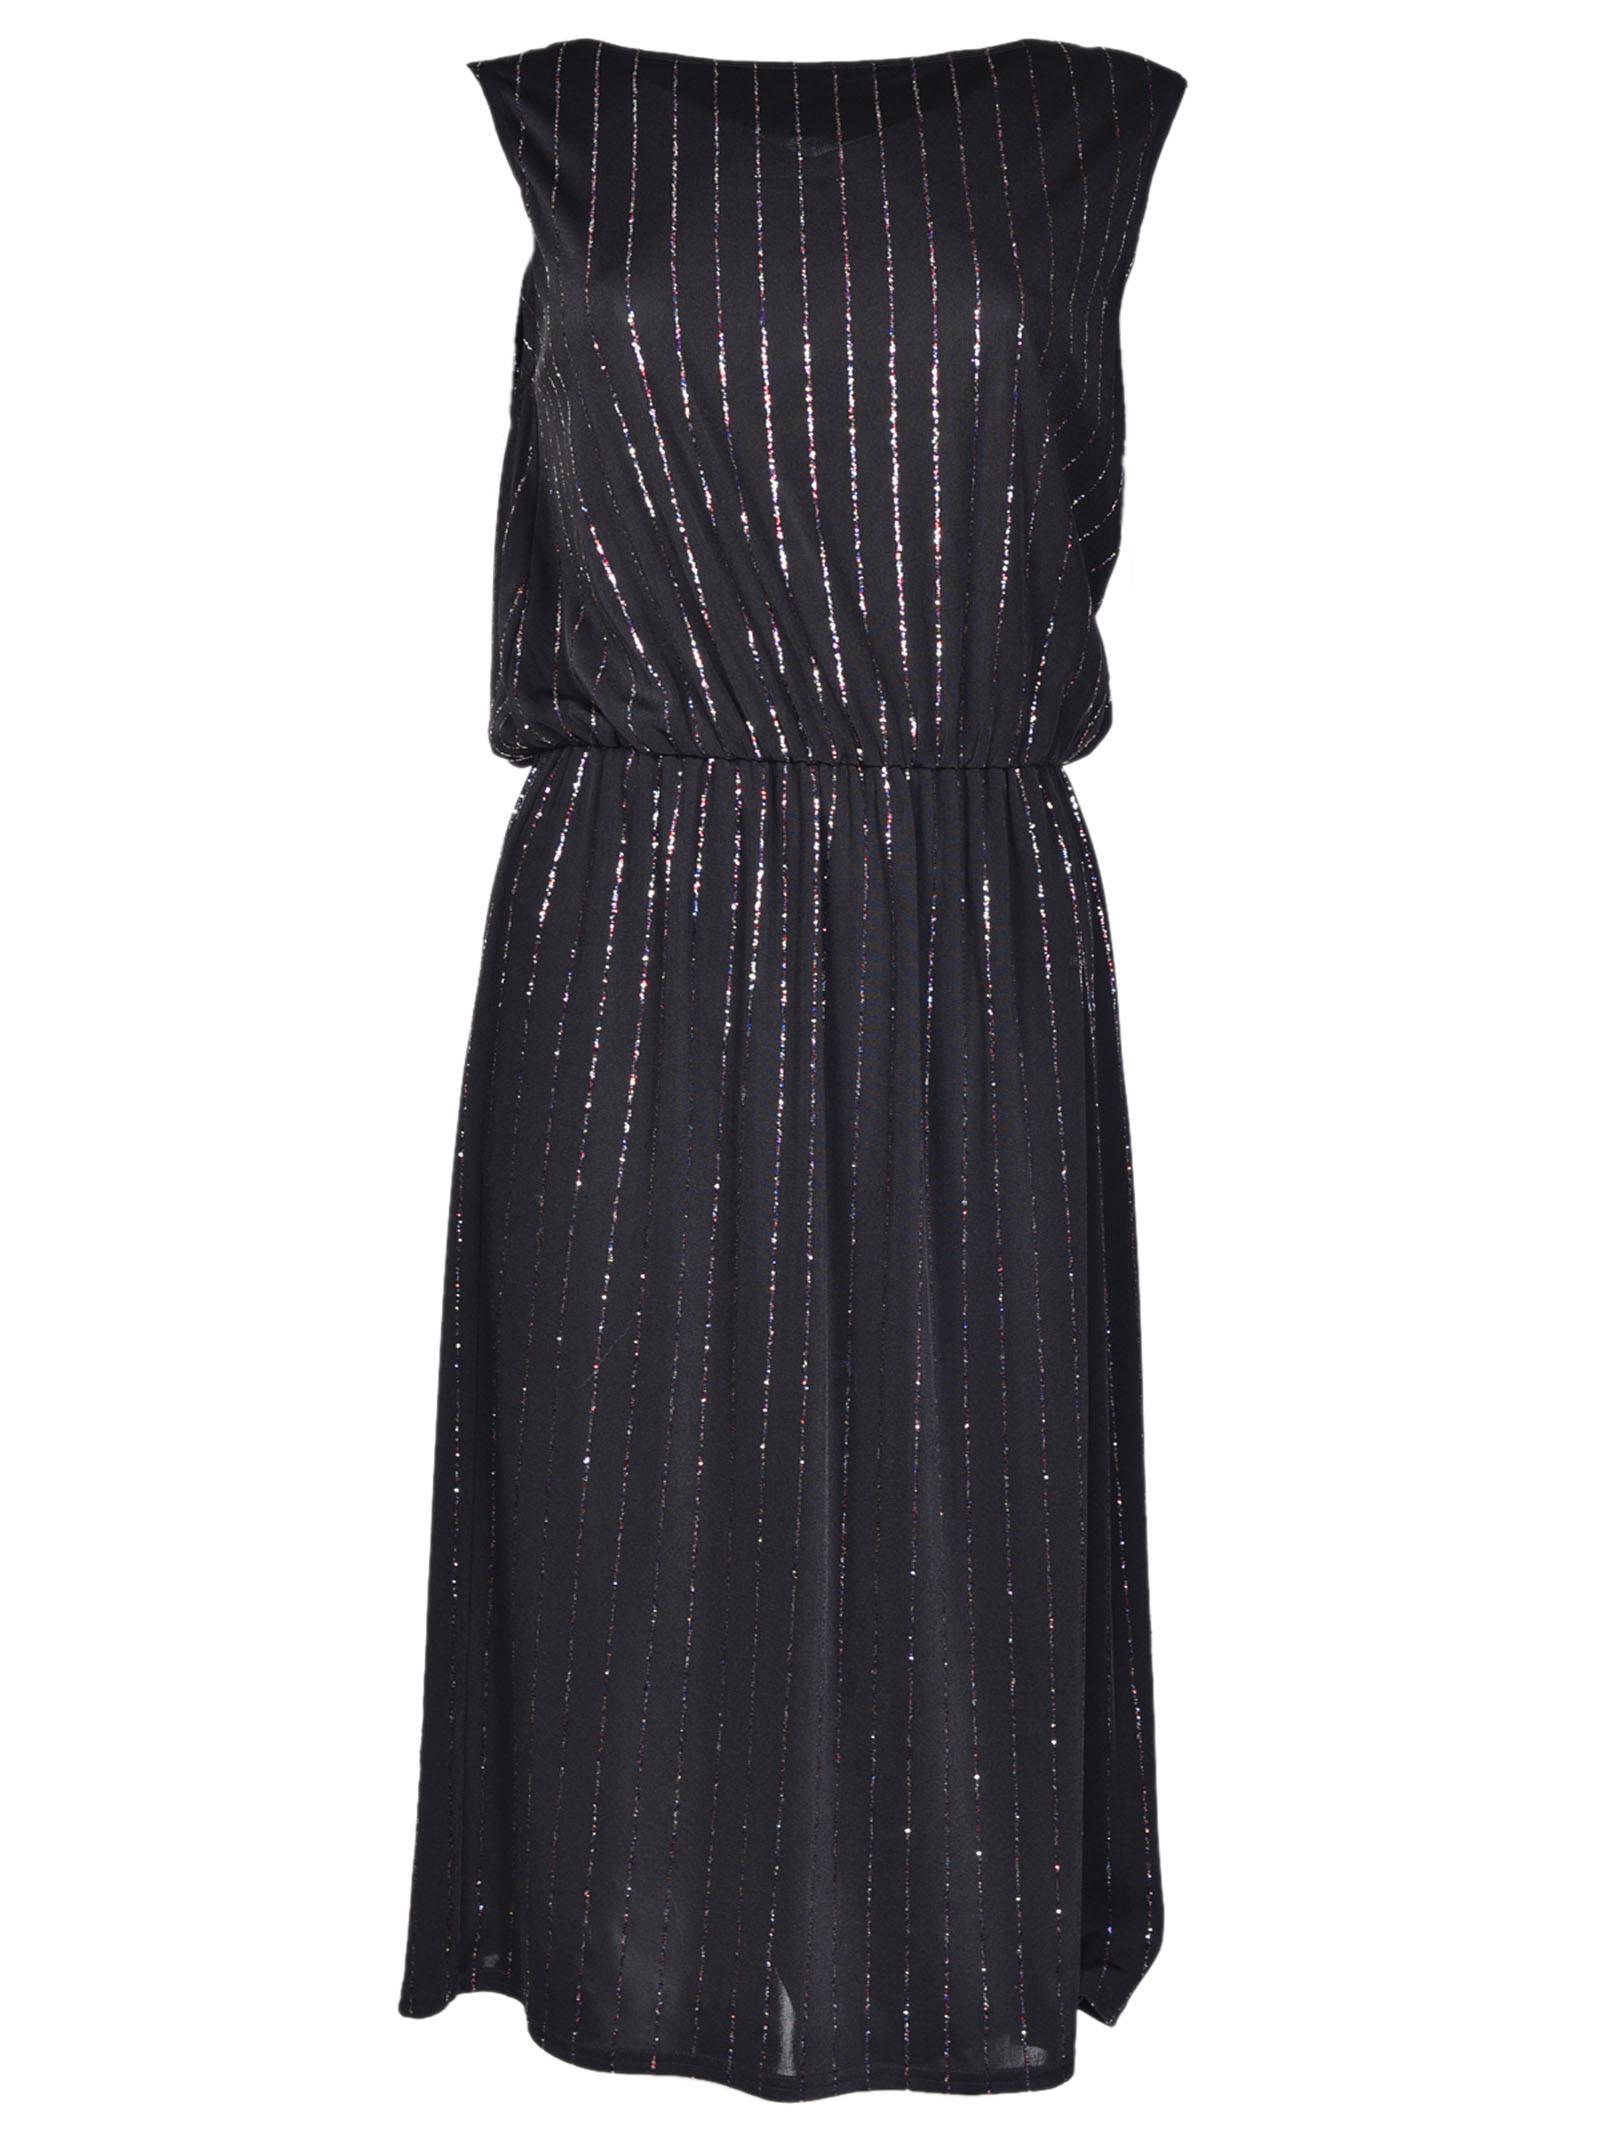 marc jacobs female marc jacobs pinstripe dress